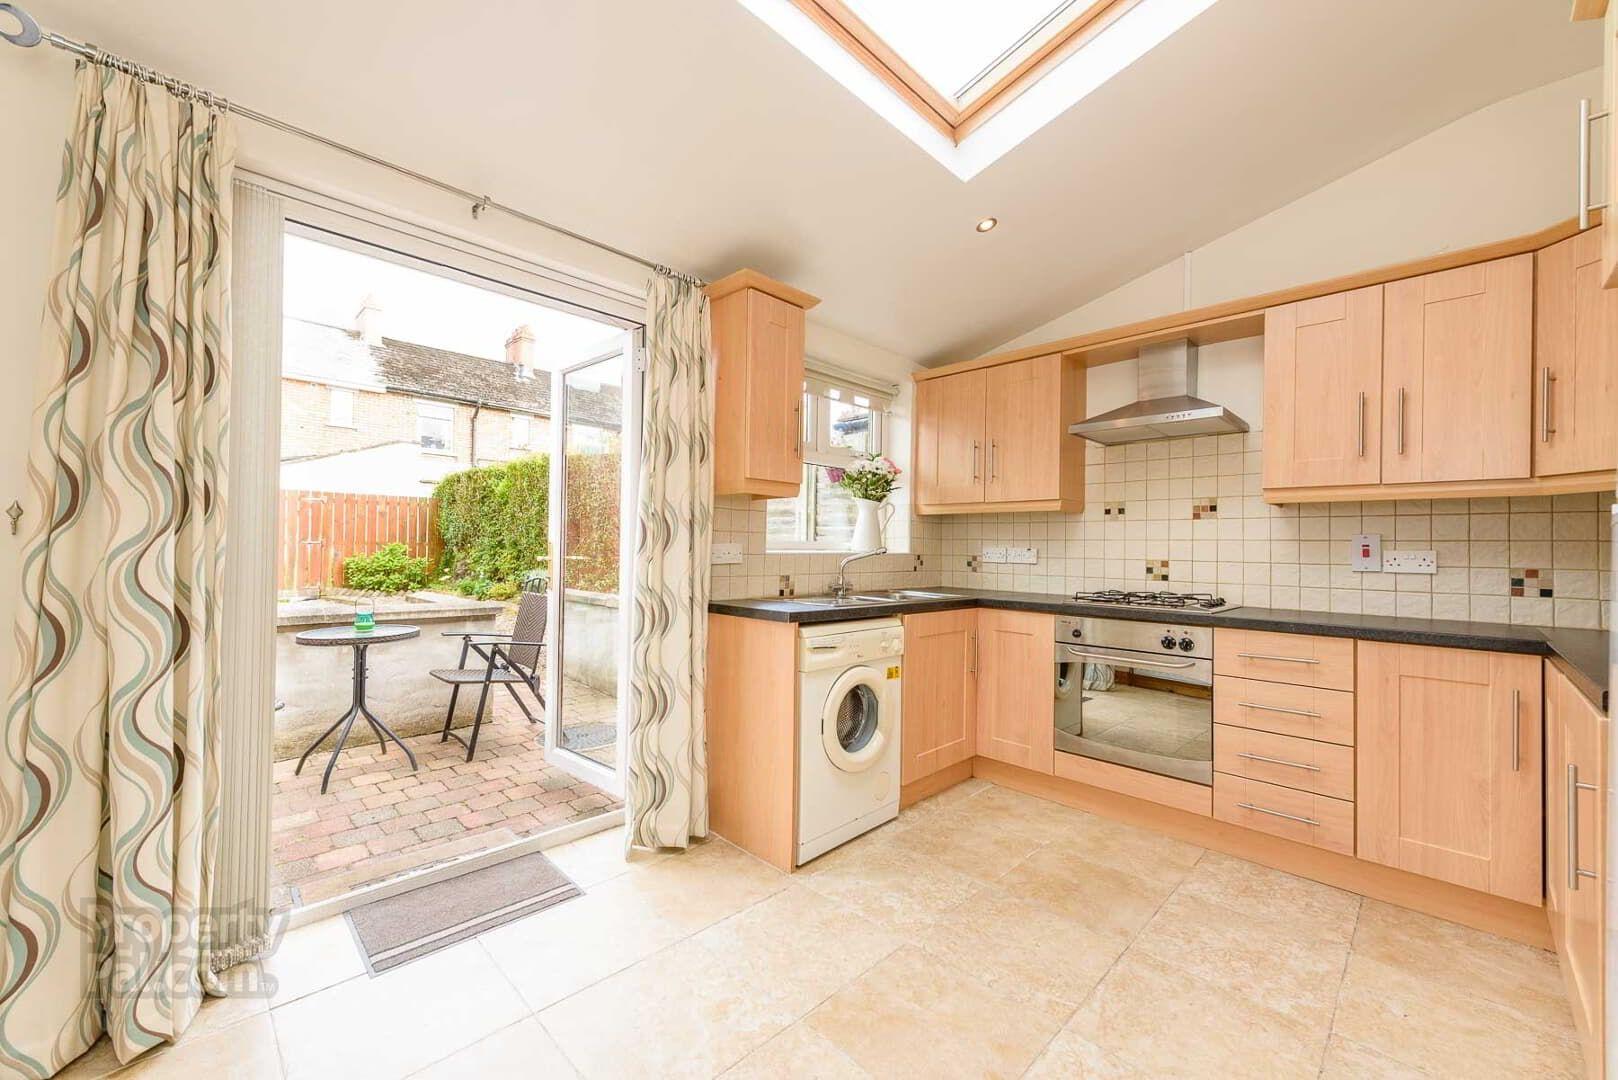 28 Ava Gardens, Ormeau Road, Belfast Home appliances